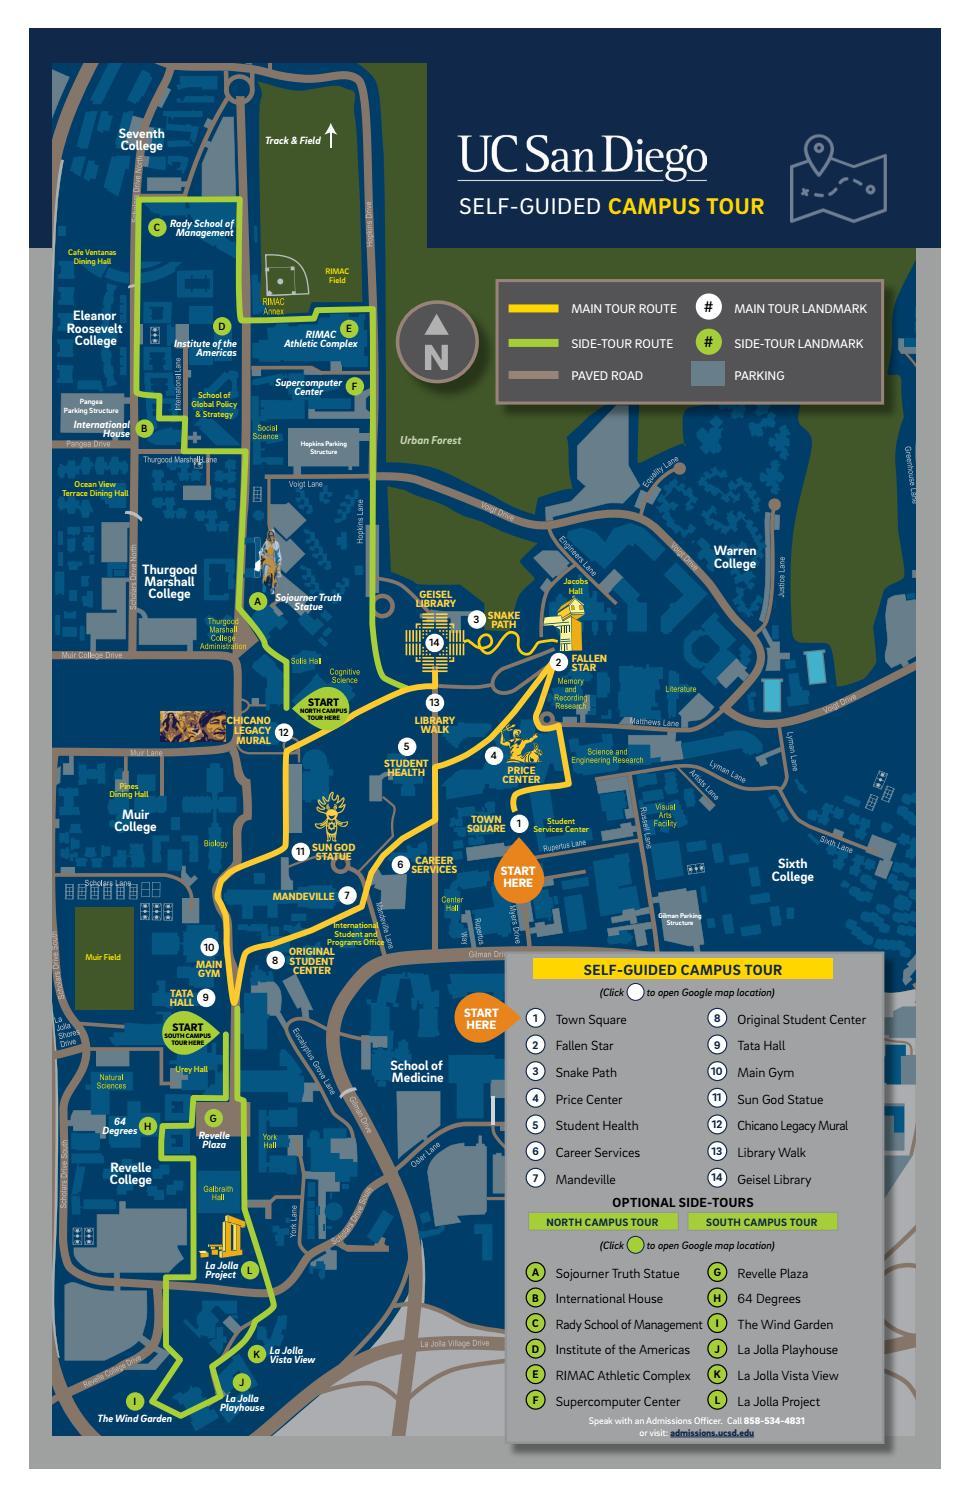 San Diego Miramar College Map : diego, miramar, college, Diego, Self-Guided, Admissions, Issuu